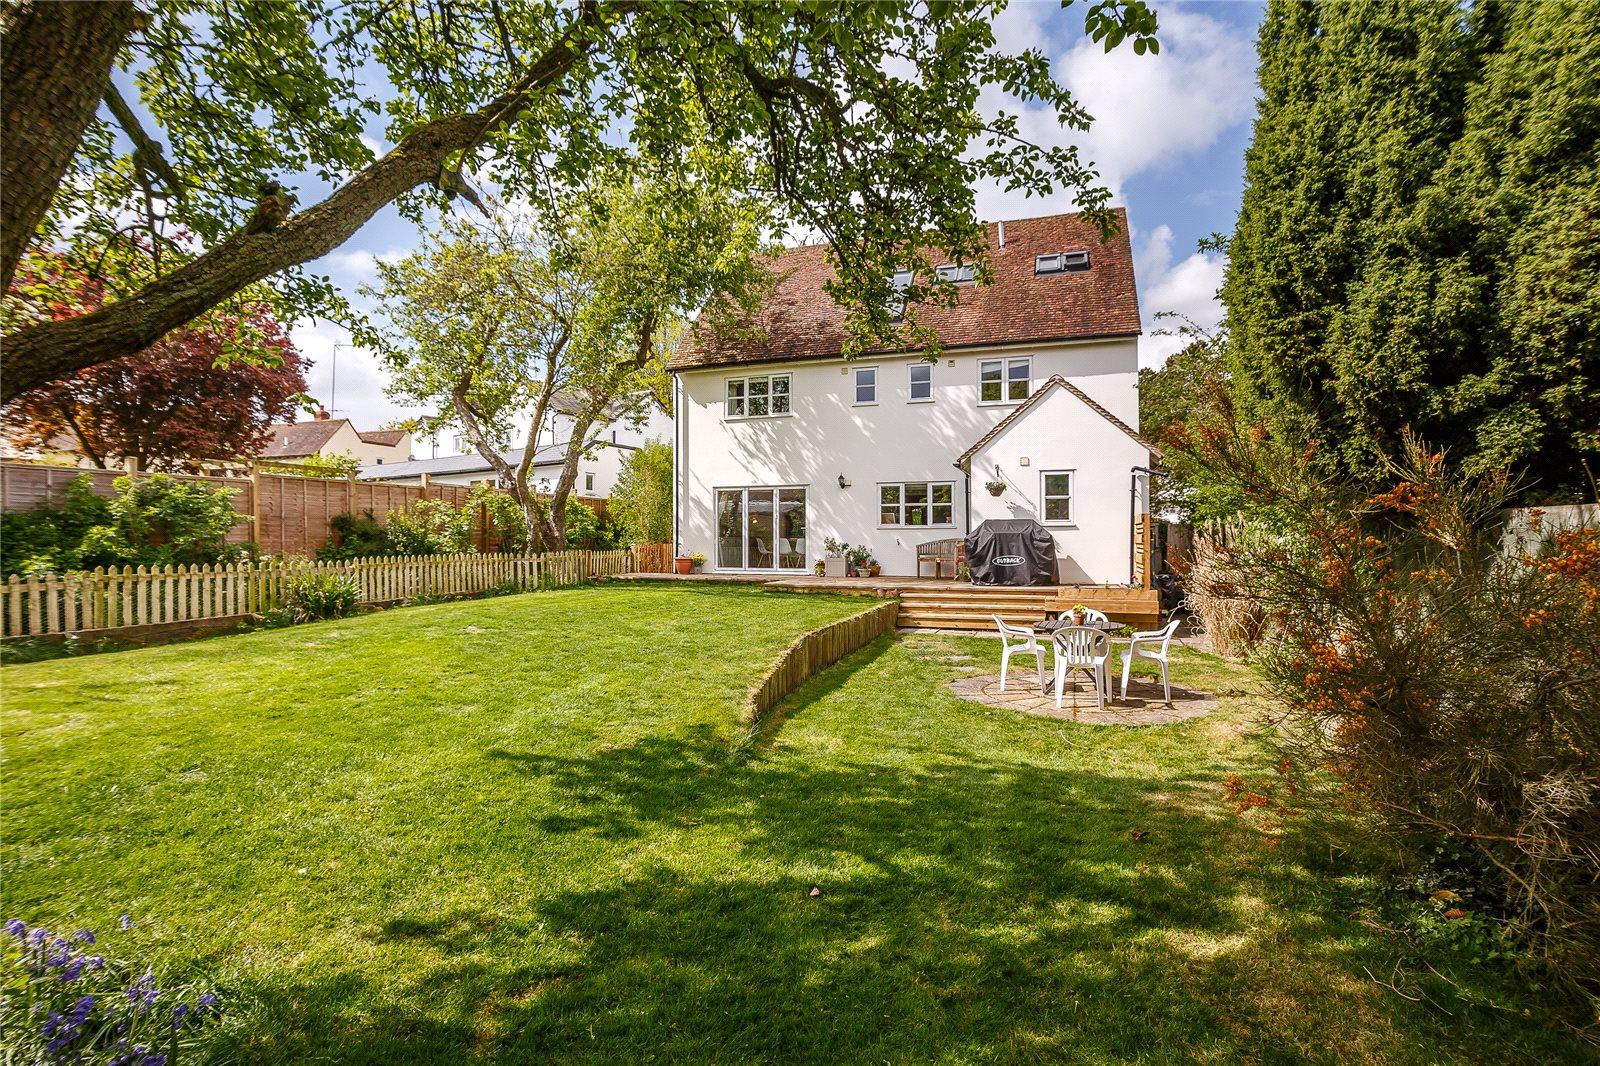 Additional photo for property listing at High Street, Barley, Royston, Hertfordshire, SG8 Royston, England